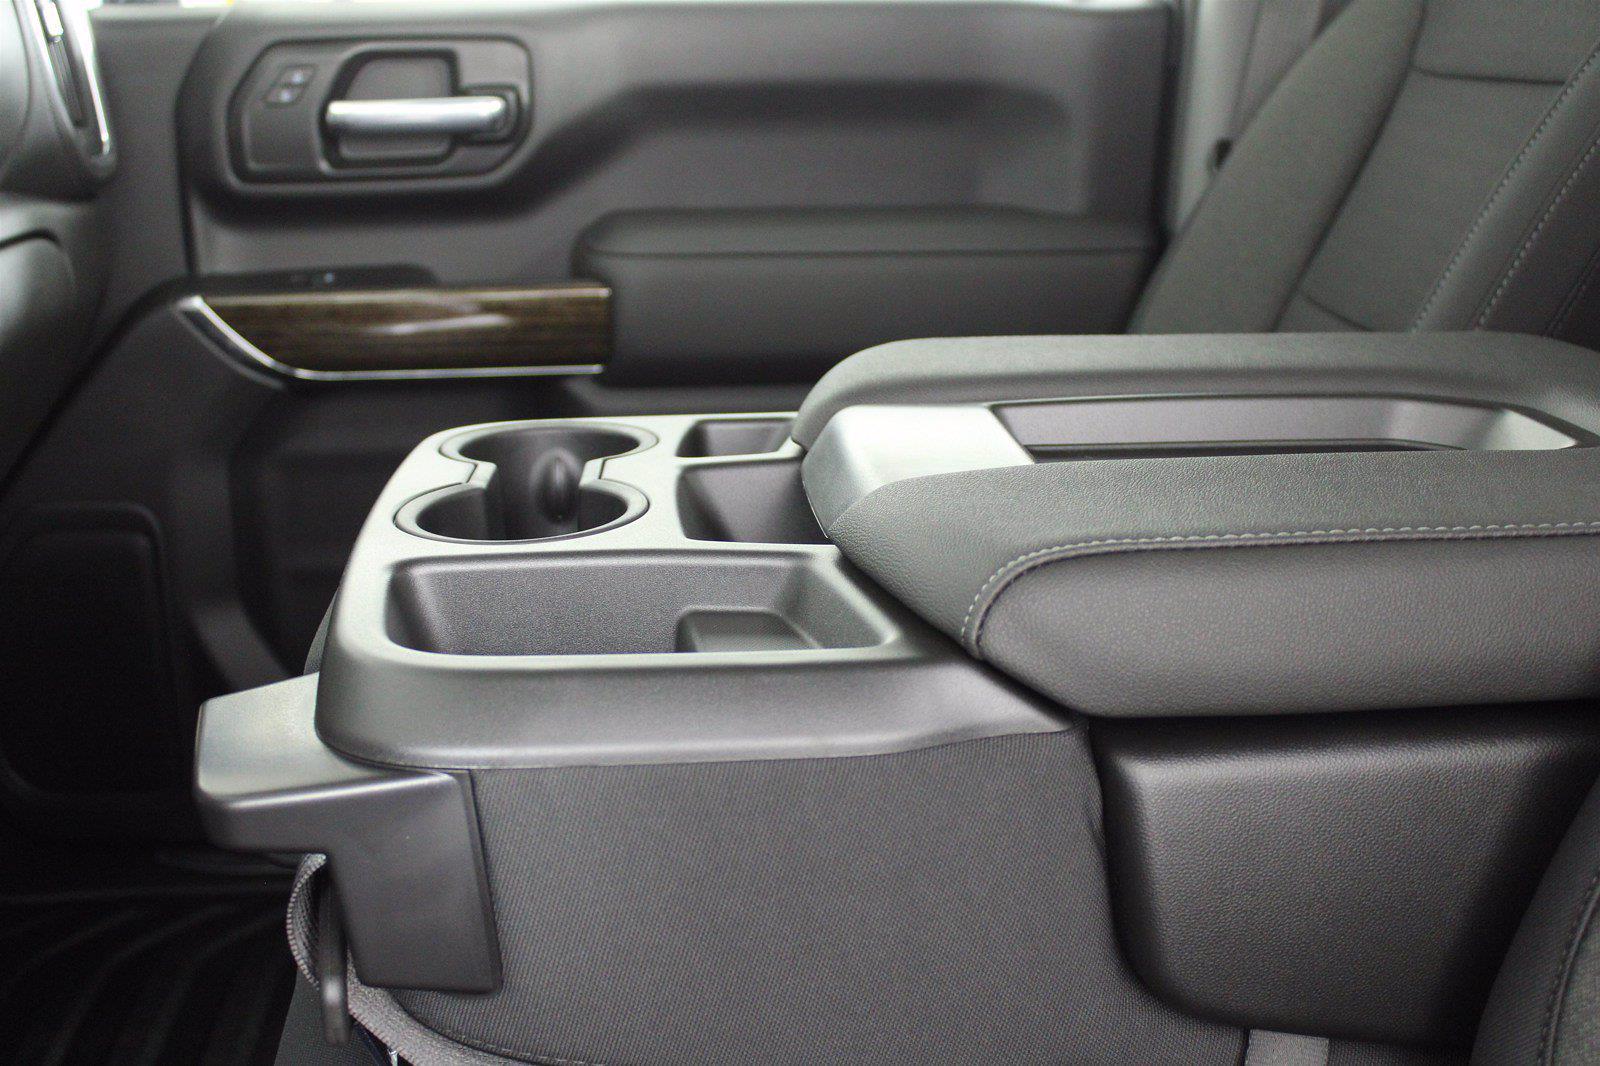 2022 Sierra 2500 Regular Cab 4x4,  Pickup #D420023 - photo 28